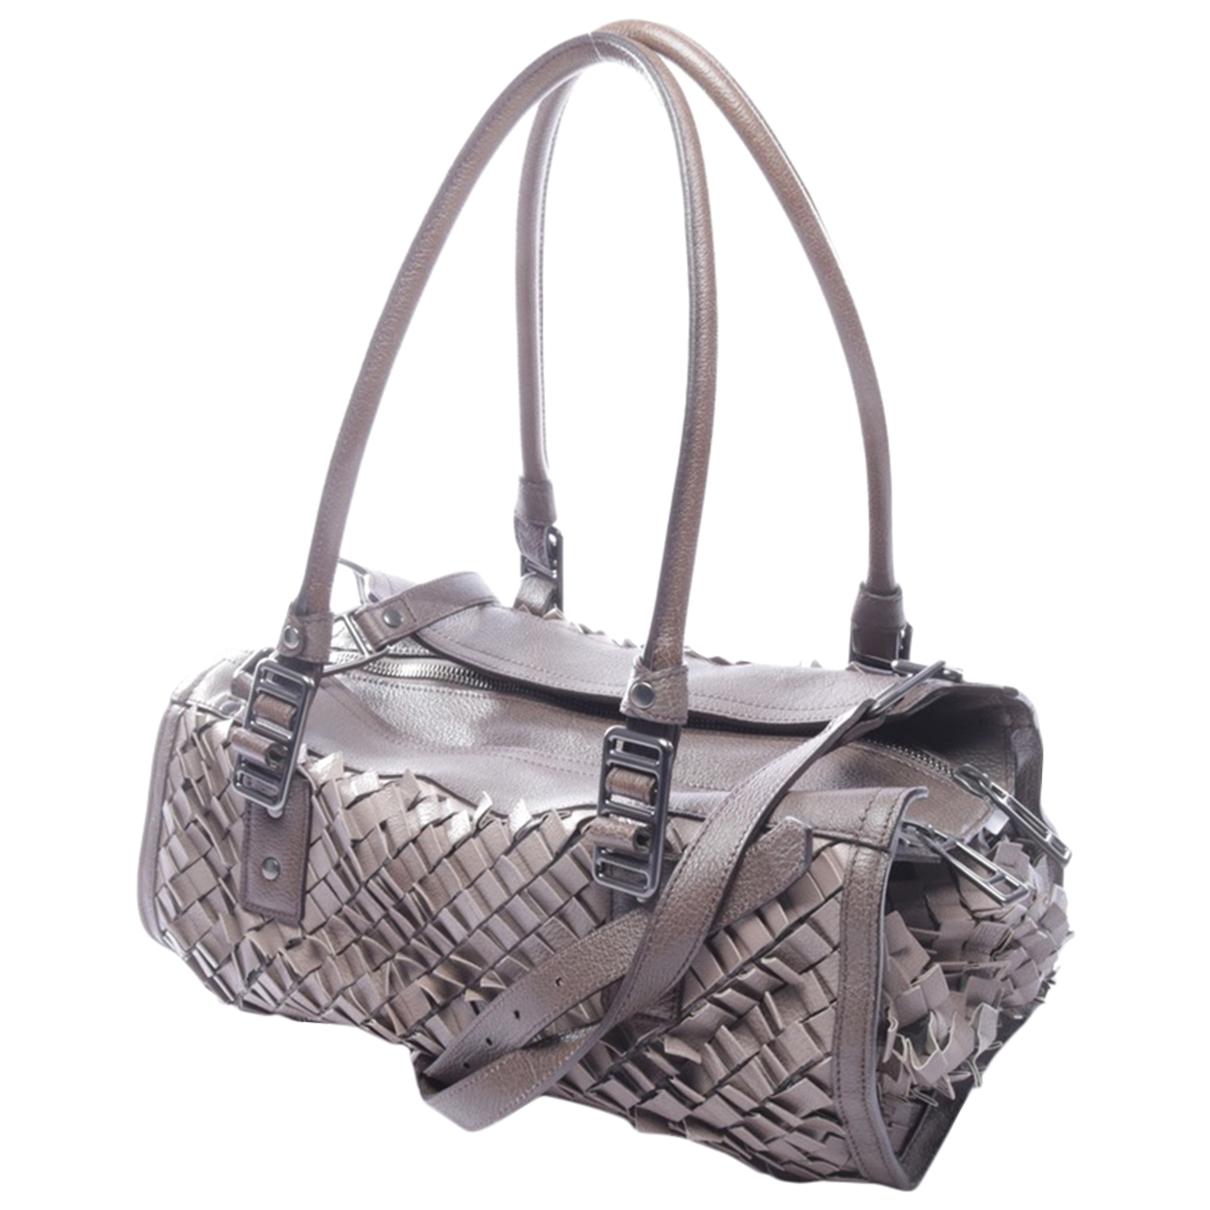 Burberry N Brown Leather handbag for Women N